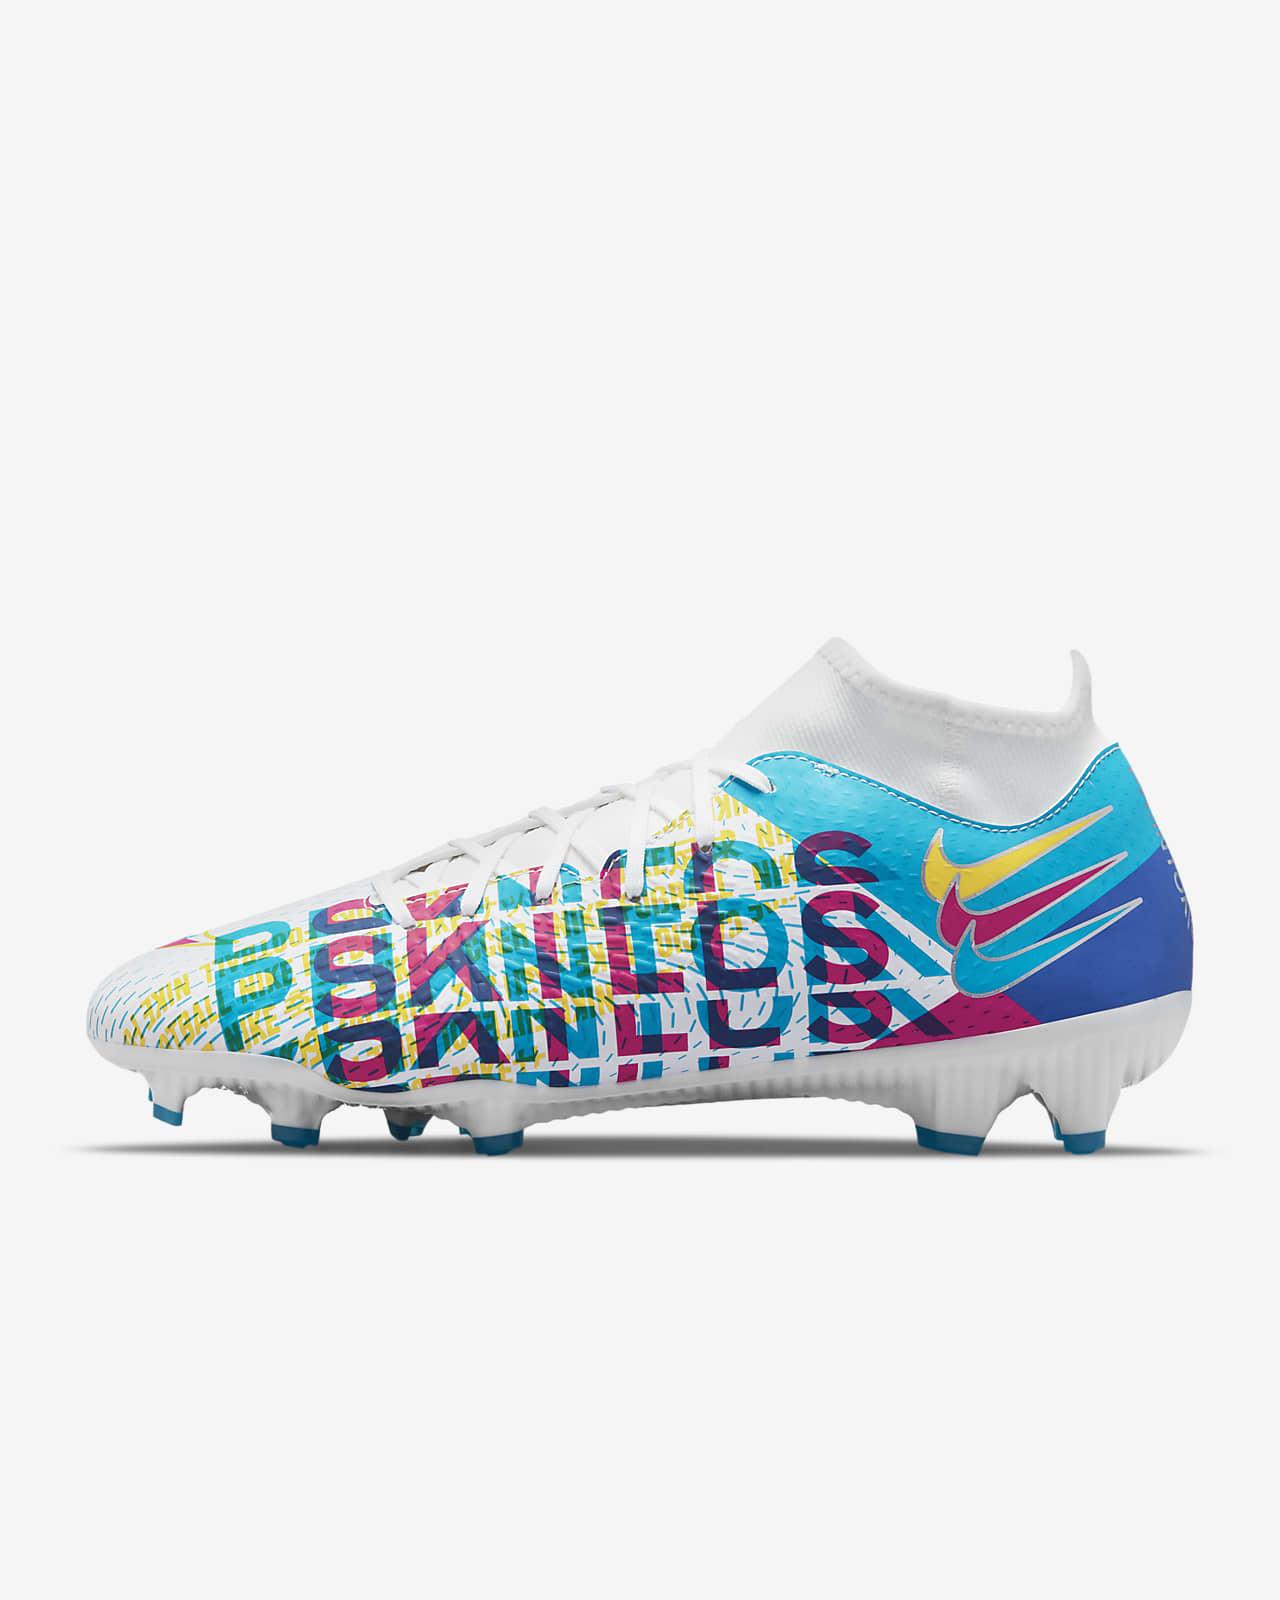 Chaussure de football multi-surfaces à crampons Nike Phantom GT Academy Dynamic Fit 3D MG